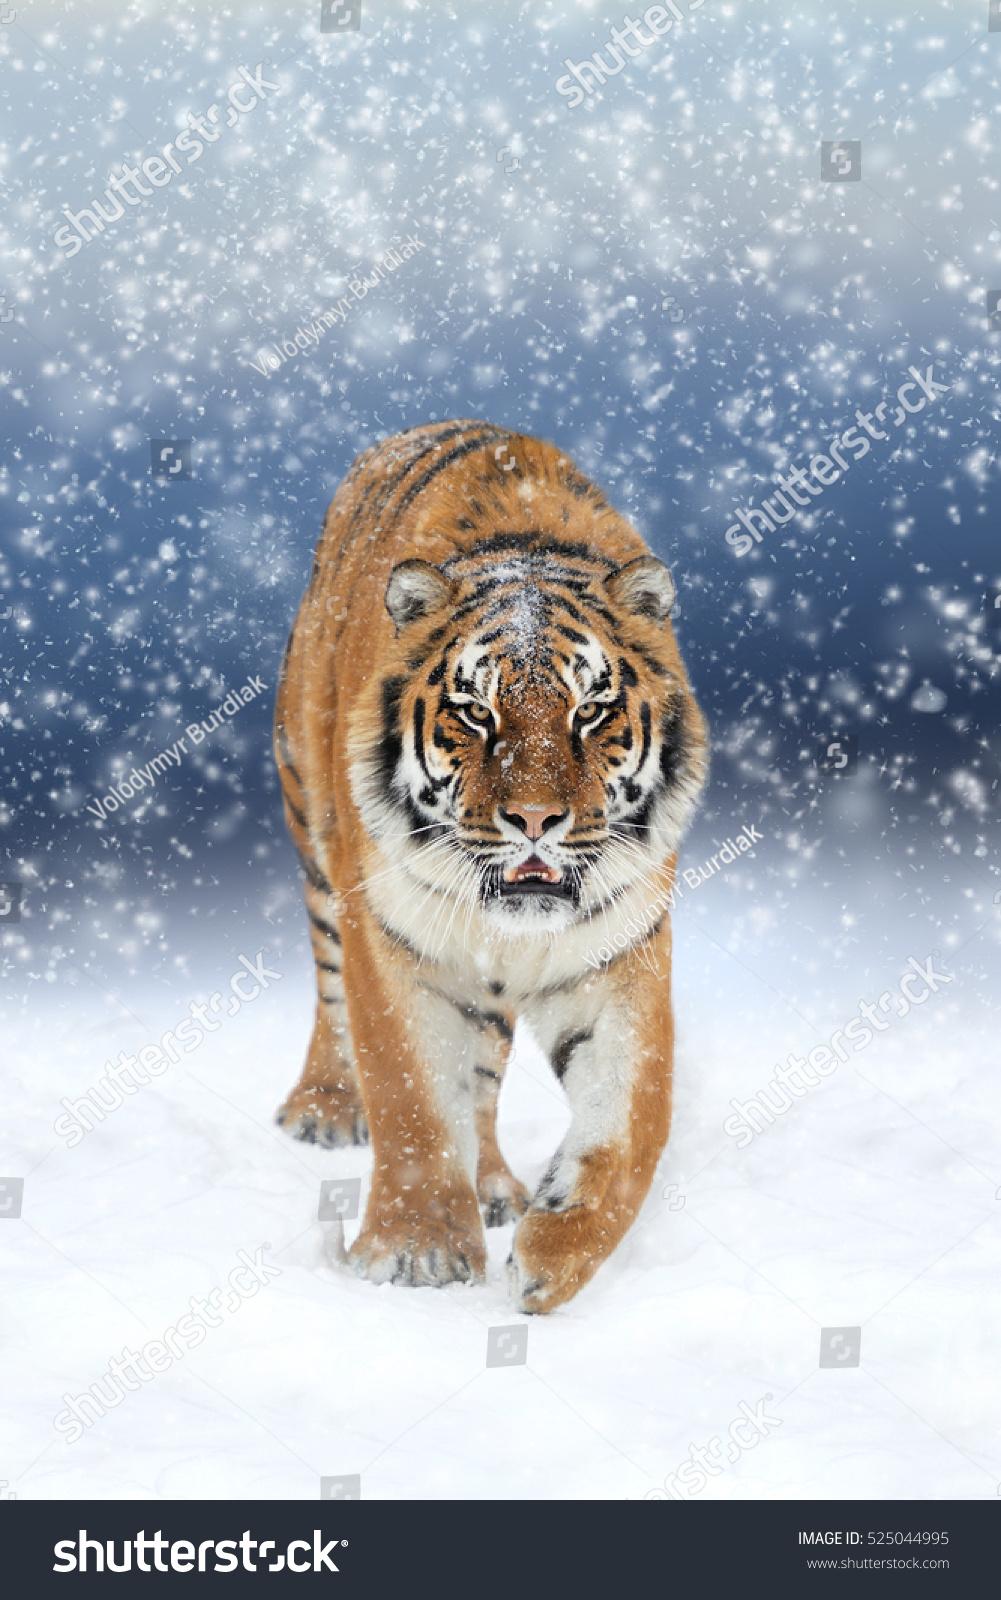 tiger wild snow - photo #23